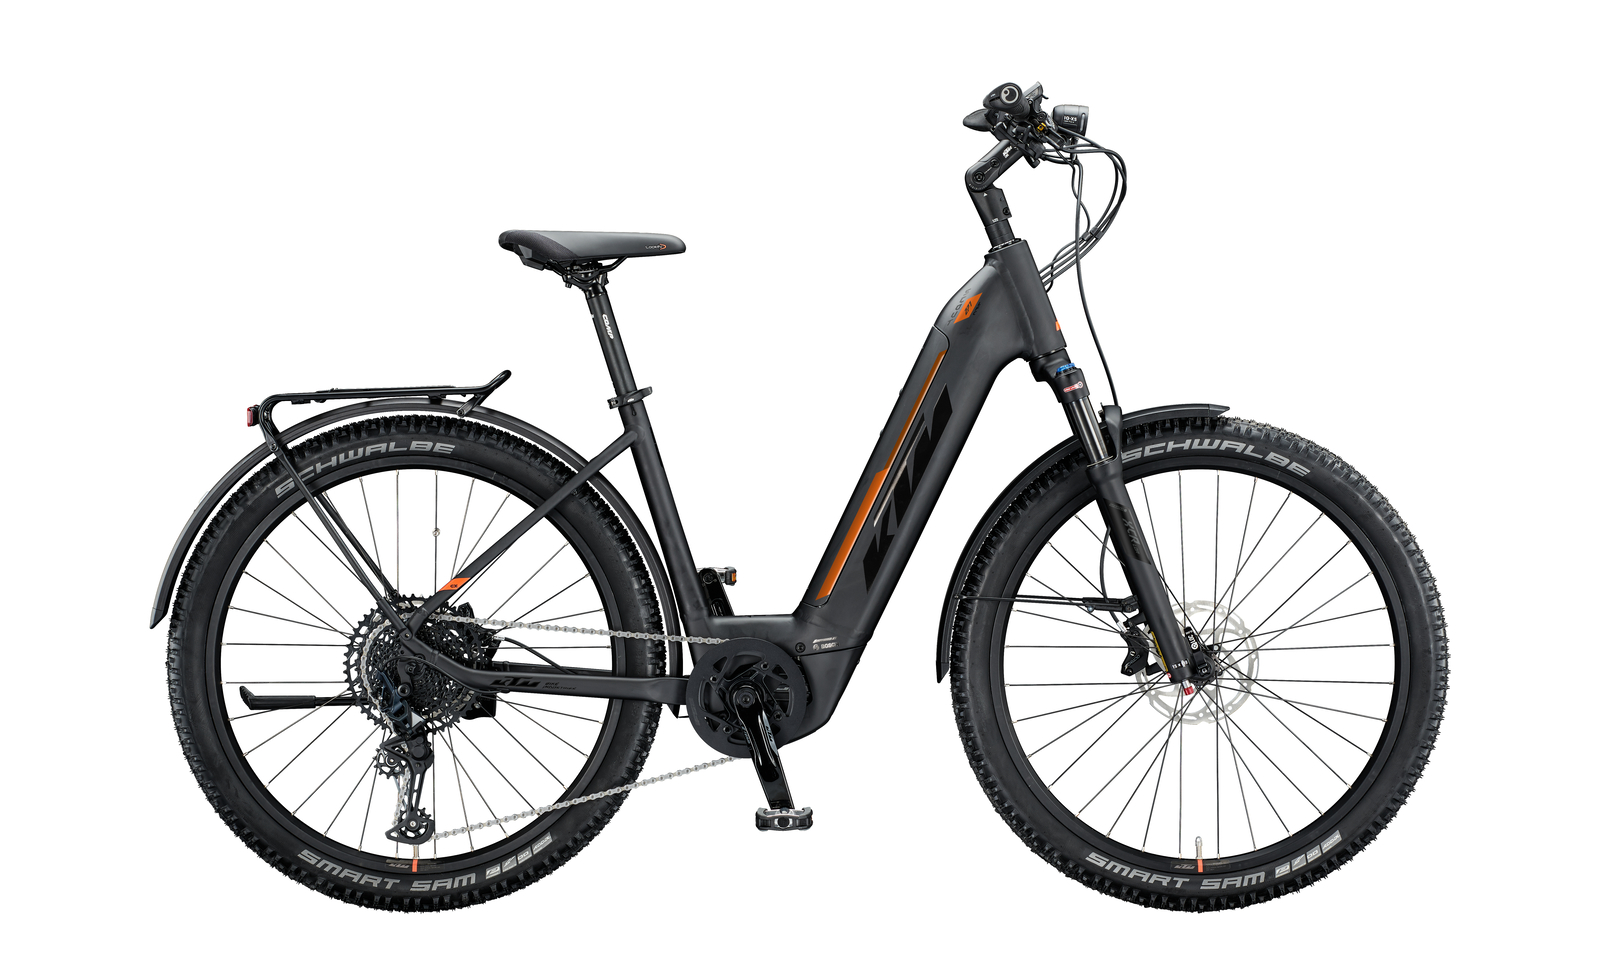 KTM Macina Scout E-Bike